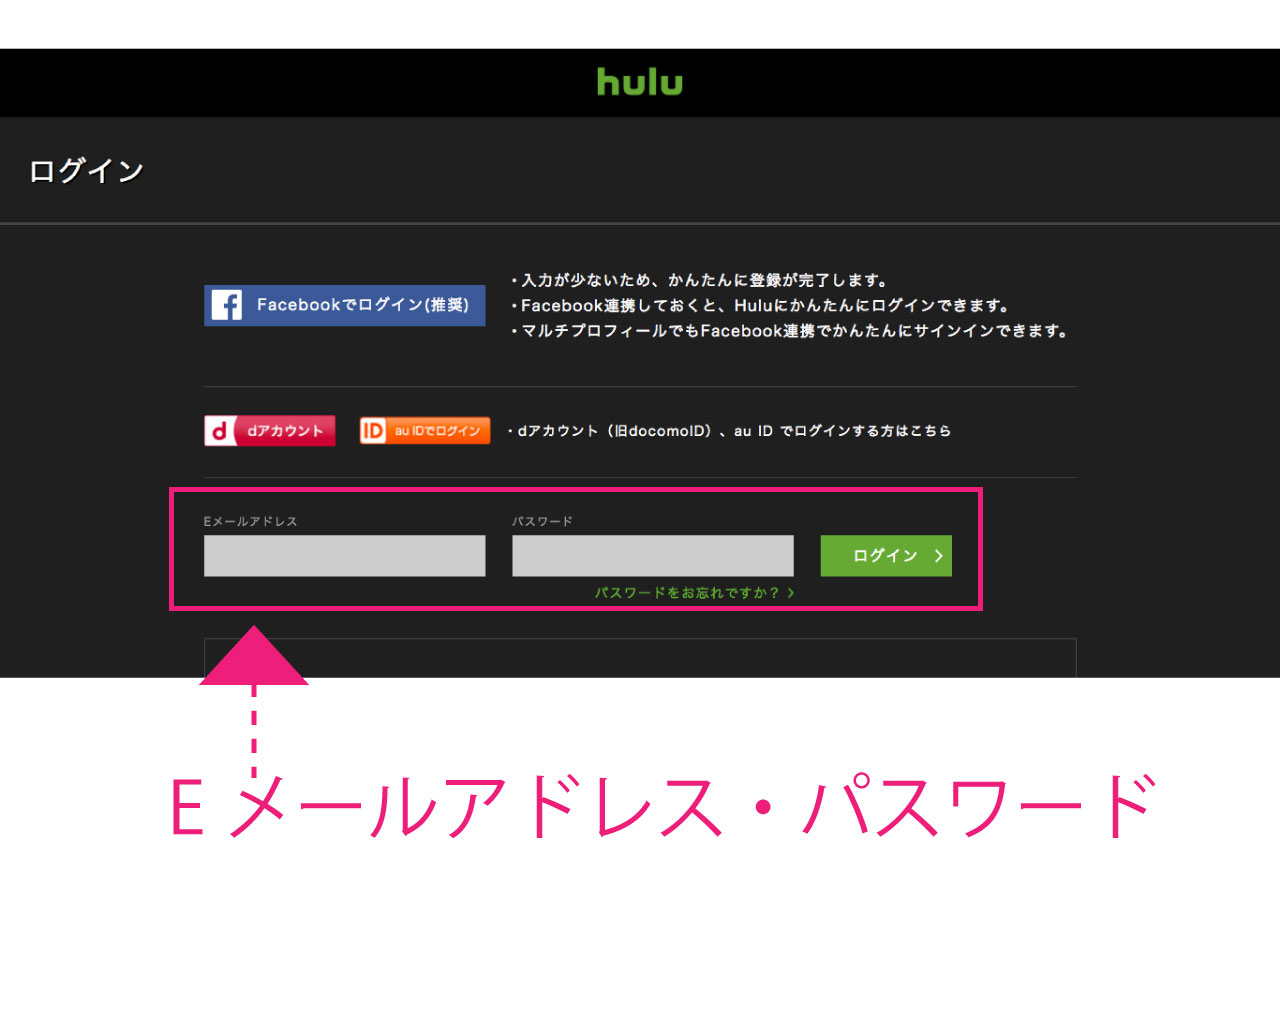 new-hulu-happyon-jp-login-0517-7